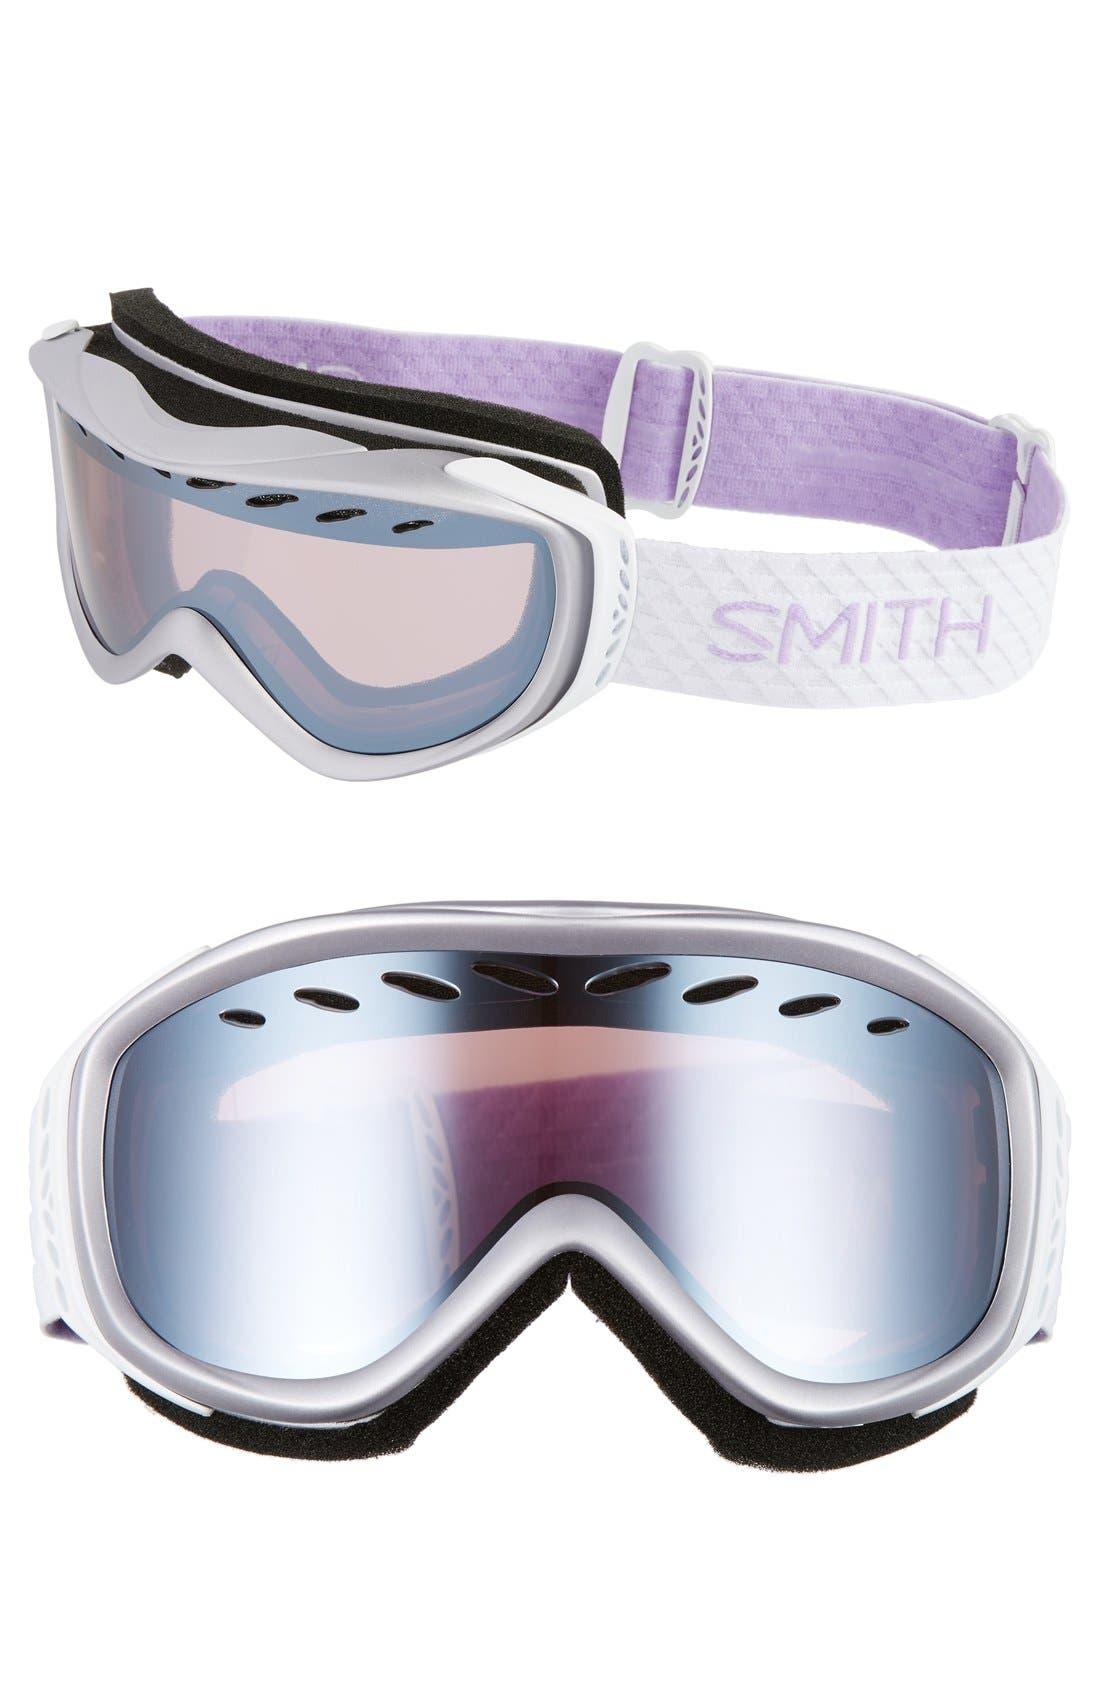 Smith 'Transit' Snow Goggles